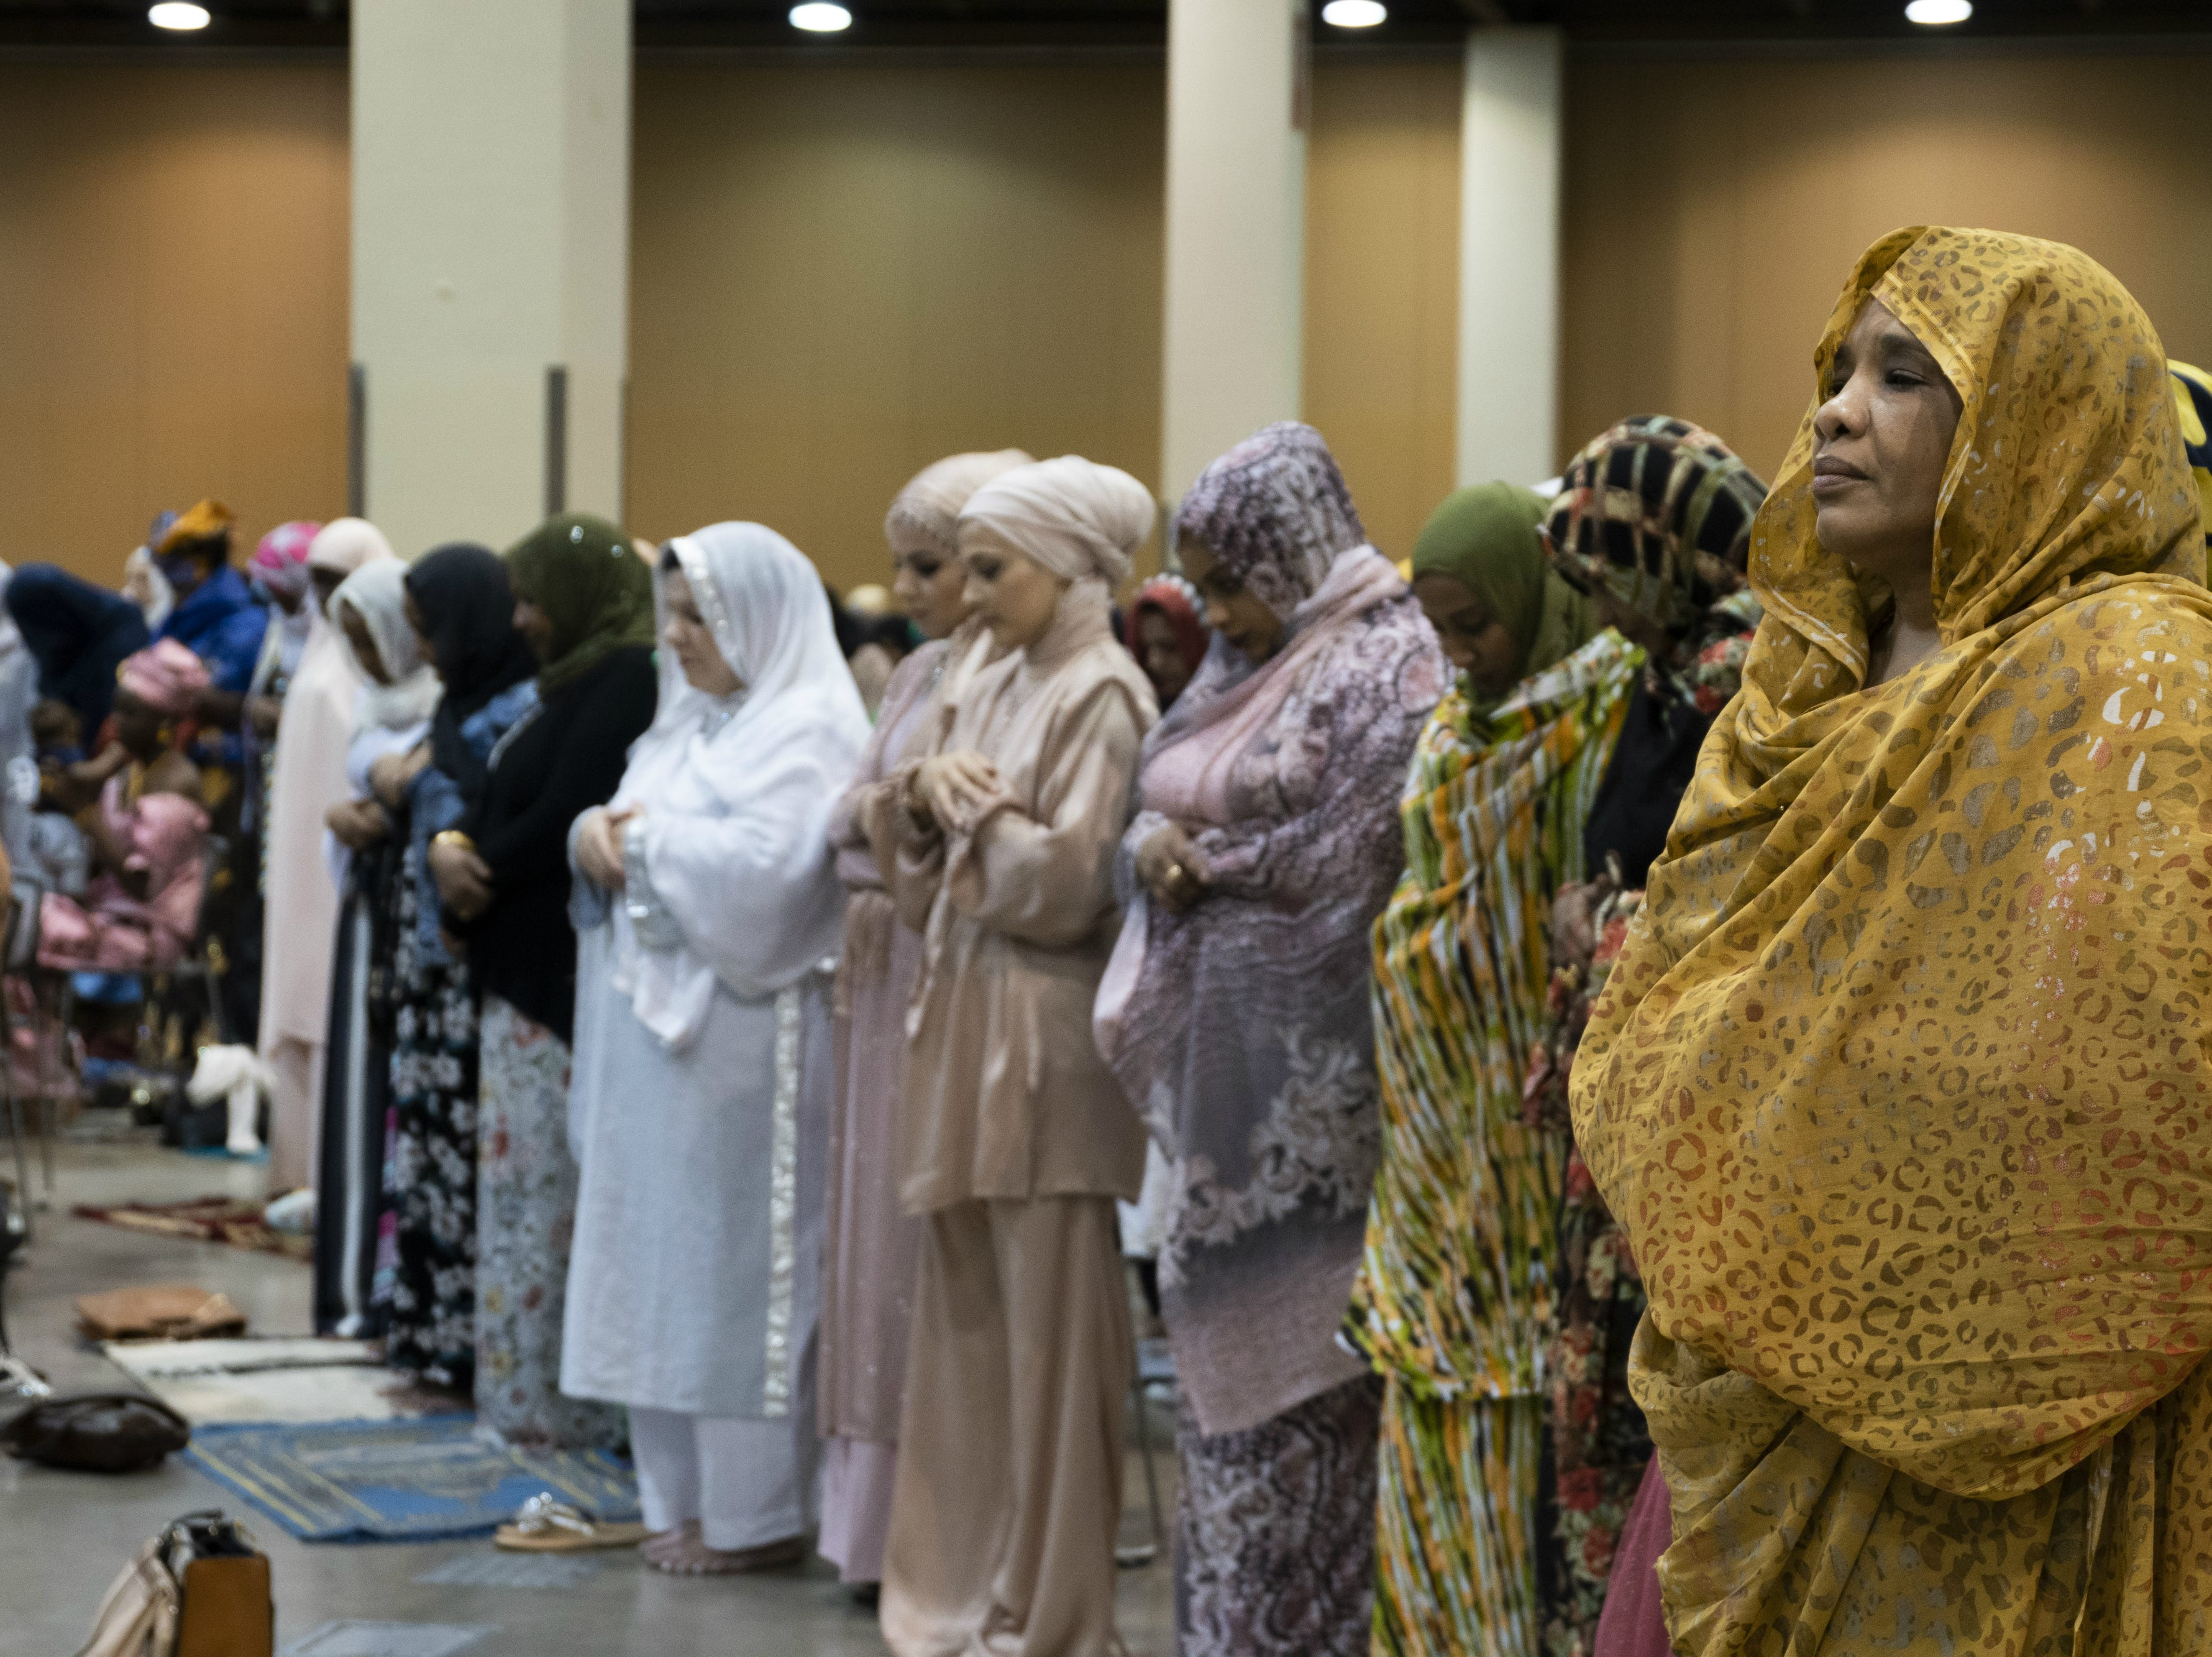 Women pray at an Eid celebration on Aug. 21, 2018, in Phoenix.